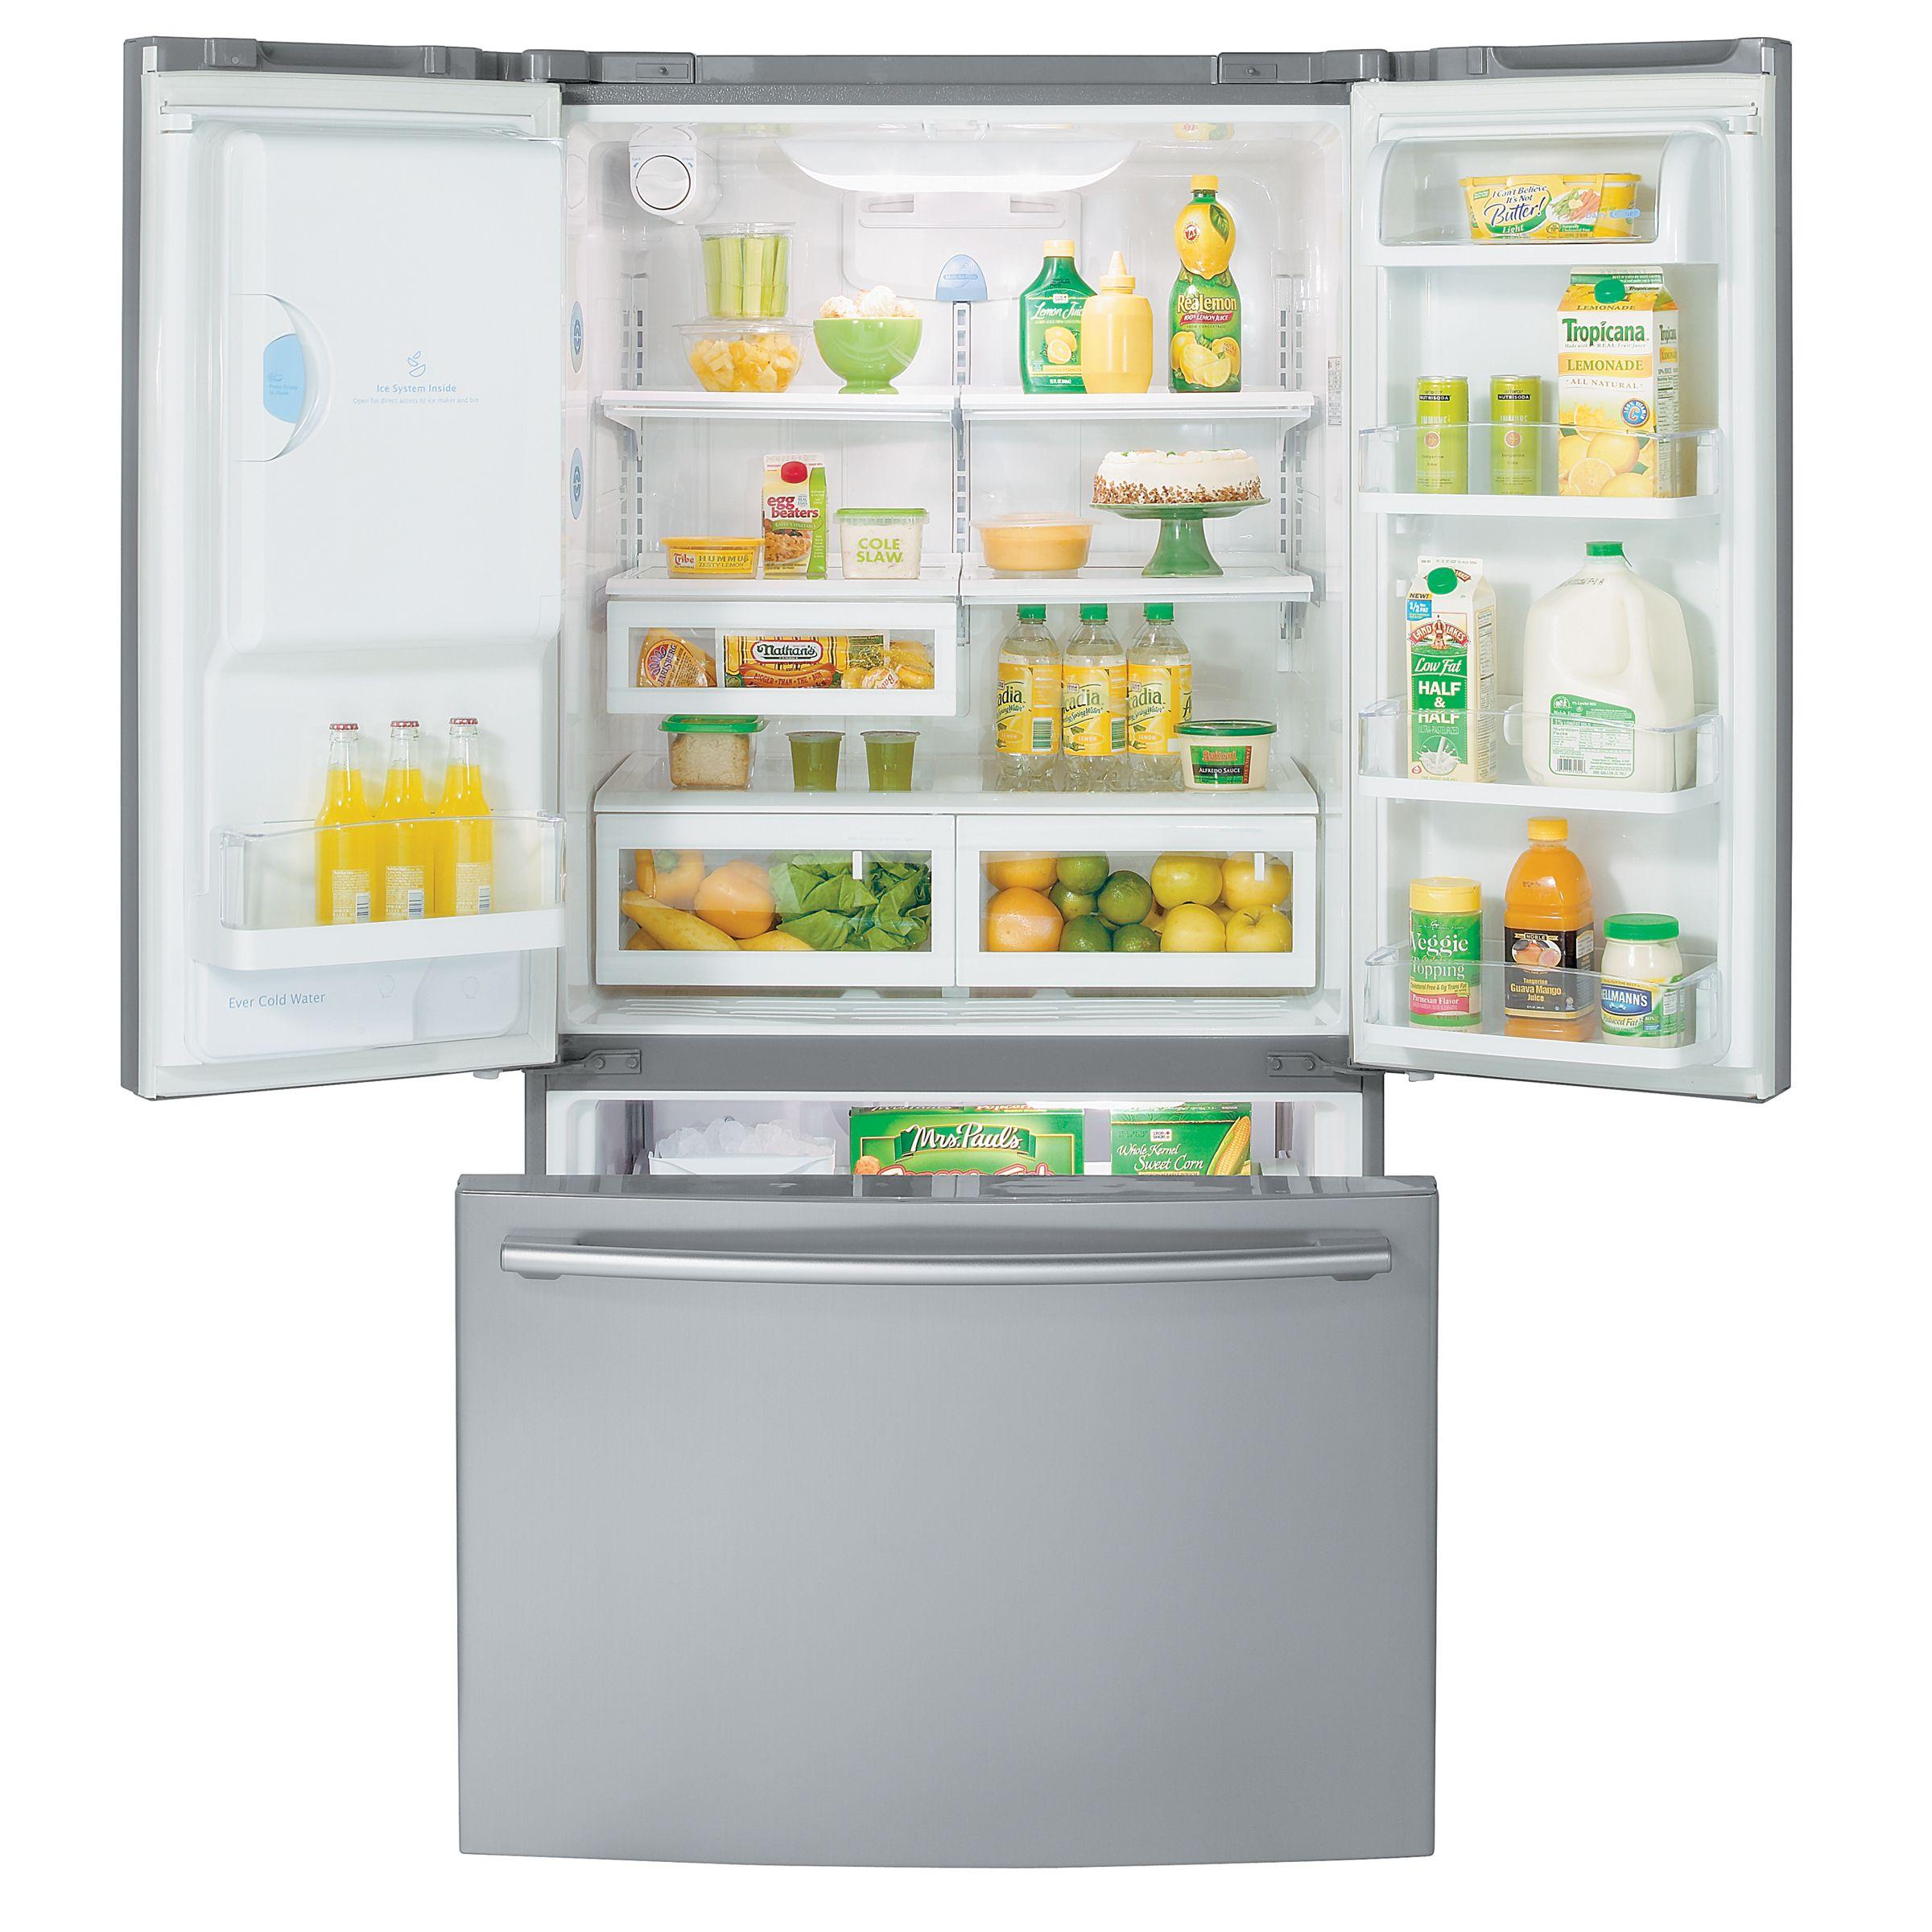 LG 24.7 cu. ft. Bottom Freezer Refrigerator